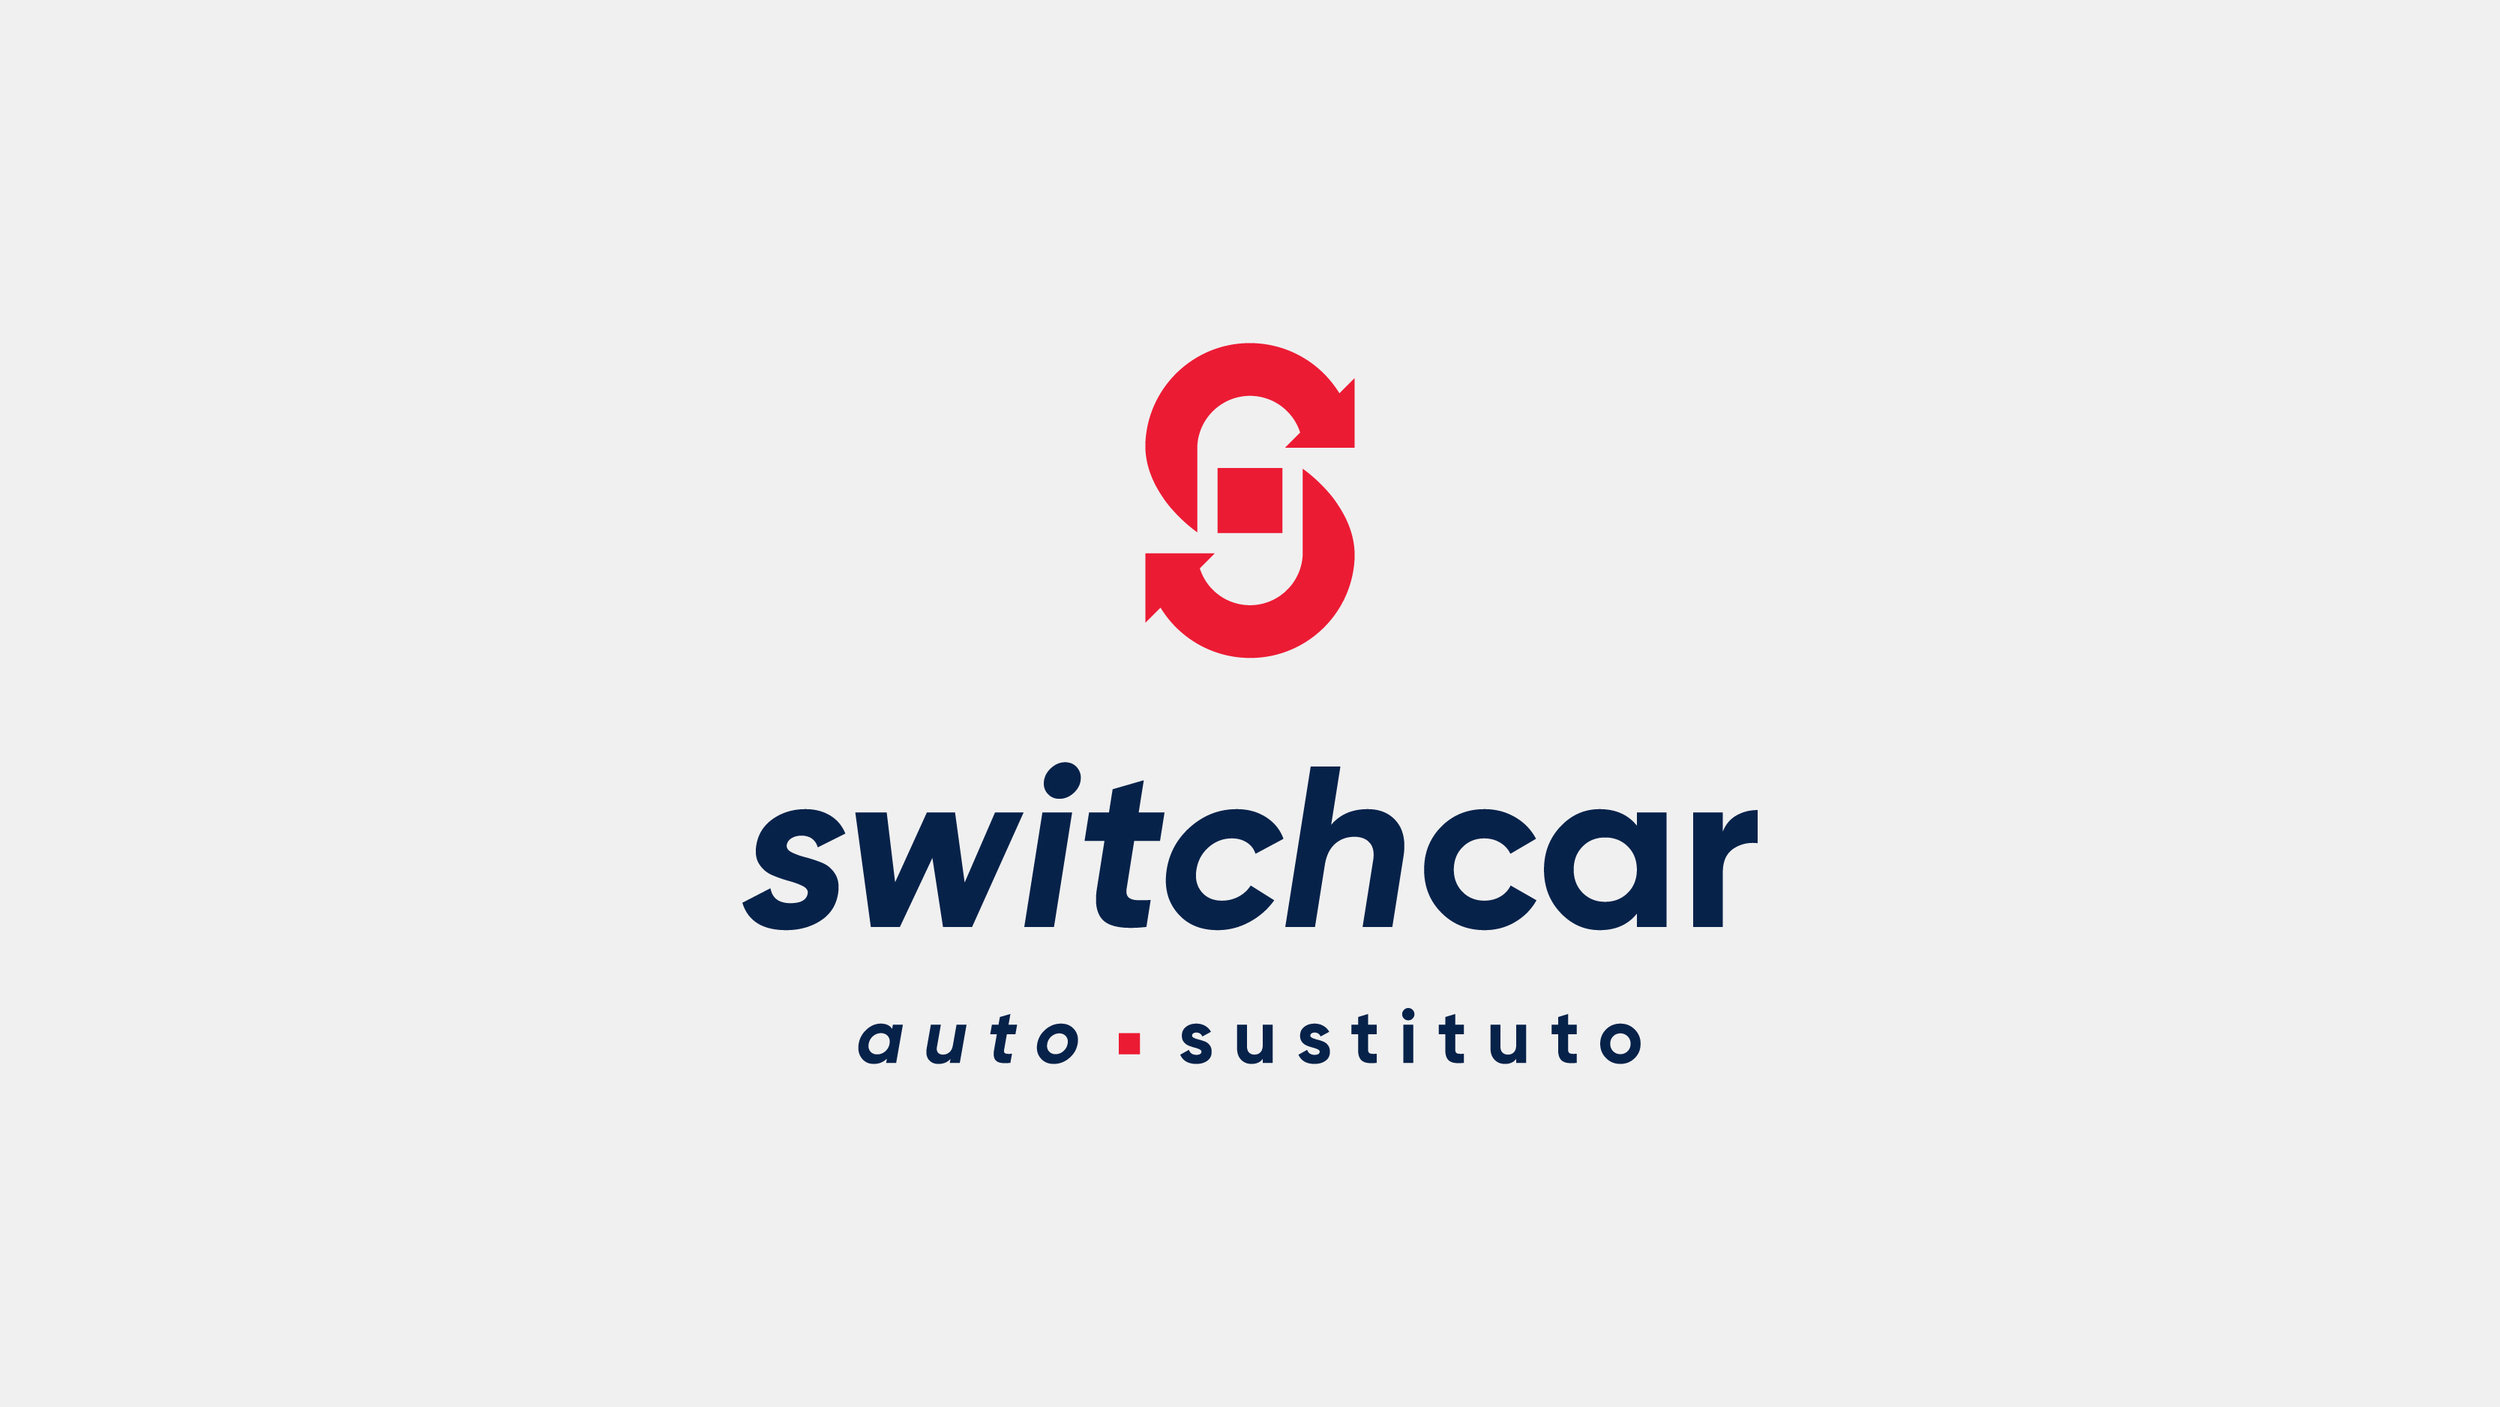 Switchcar - Presentación-02.jpg